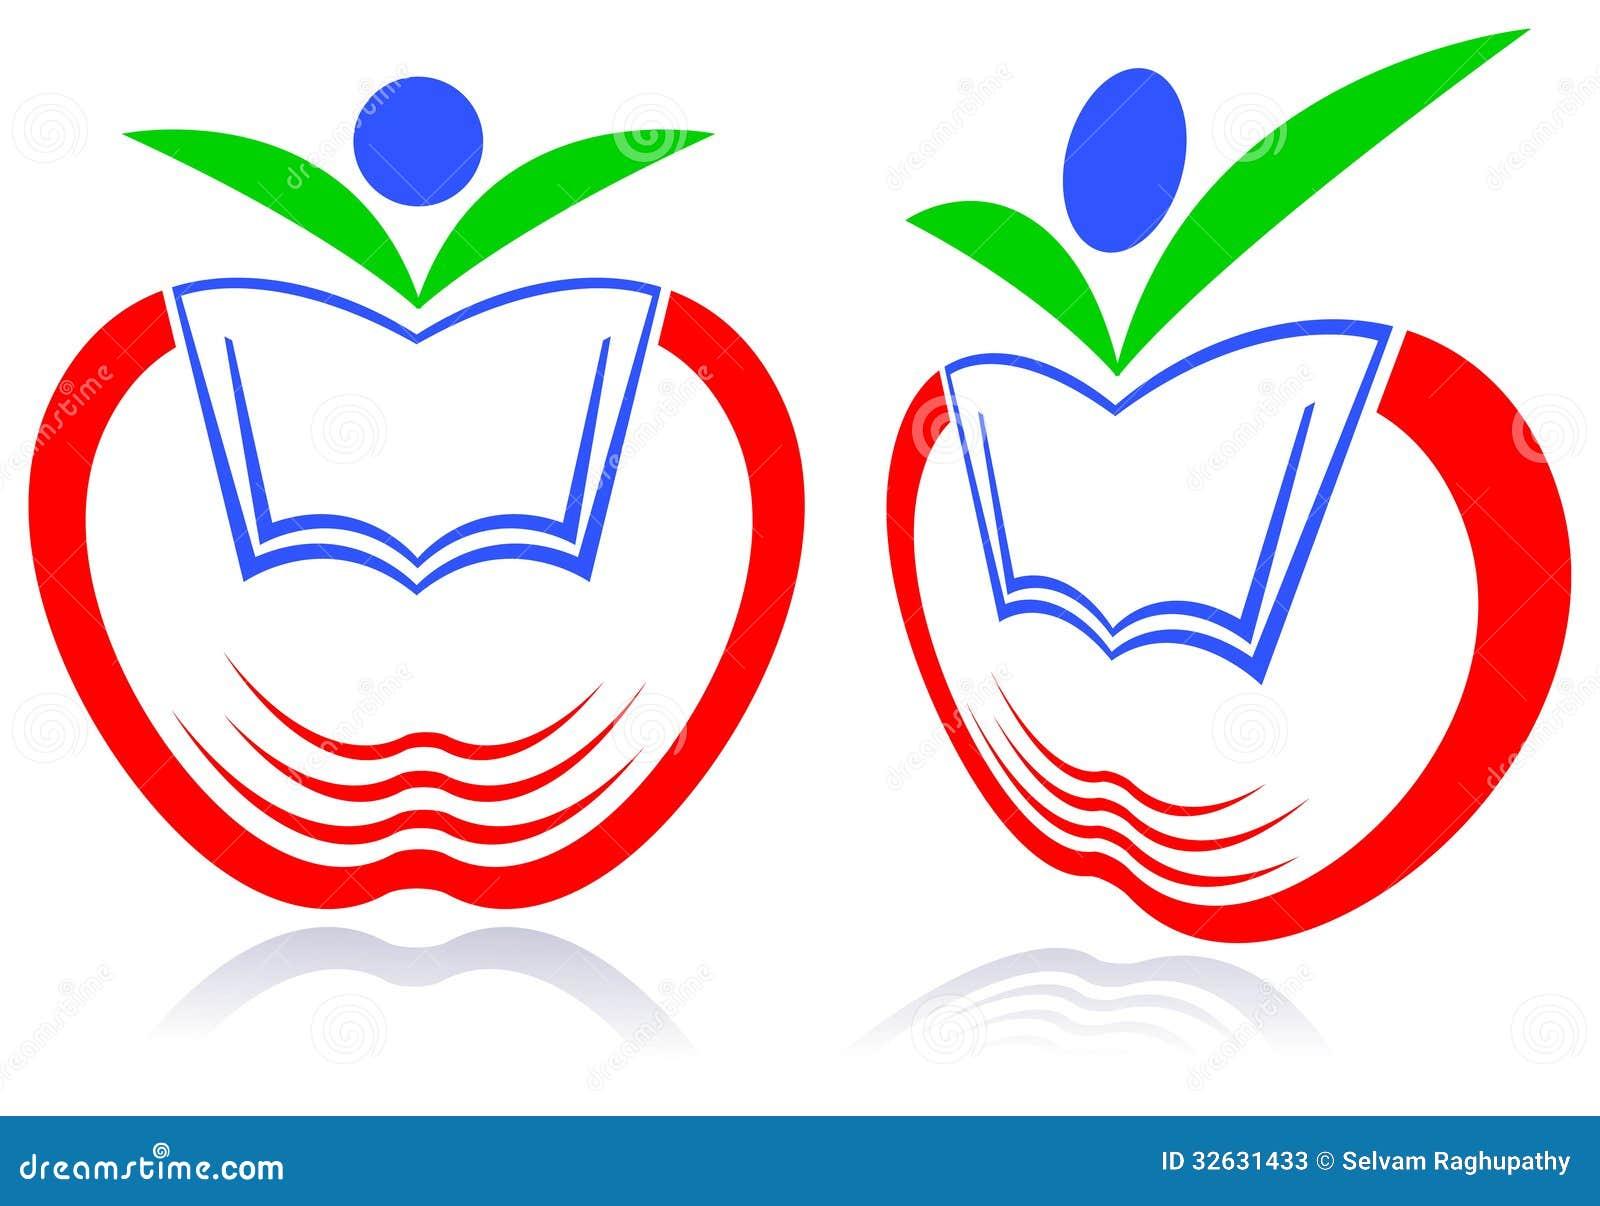 Line Art Logo Design : Kid education logo stock vector image of adorable health